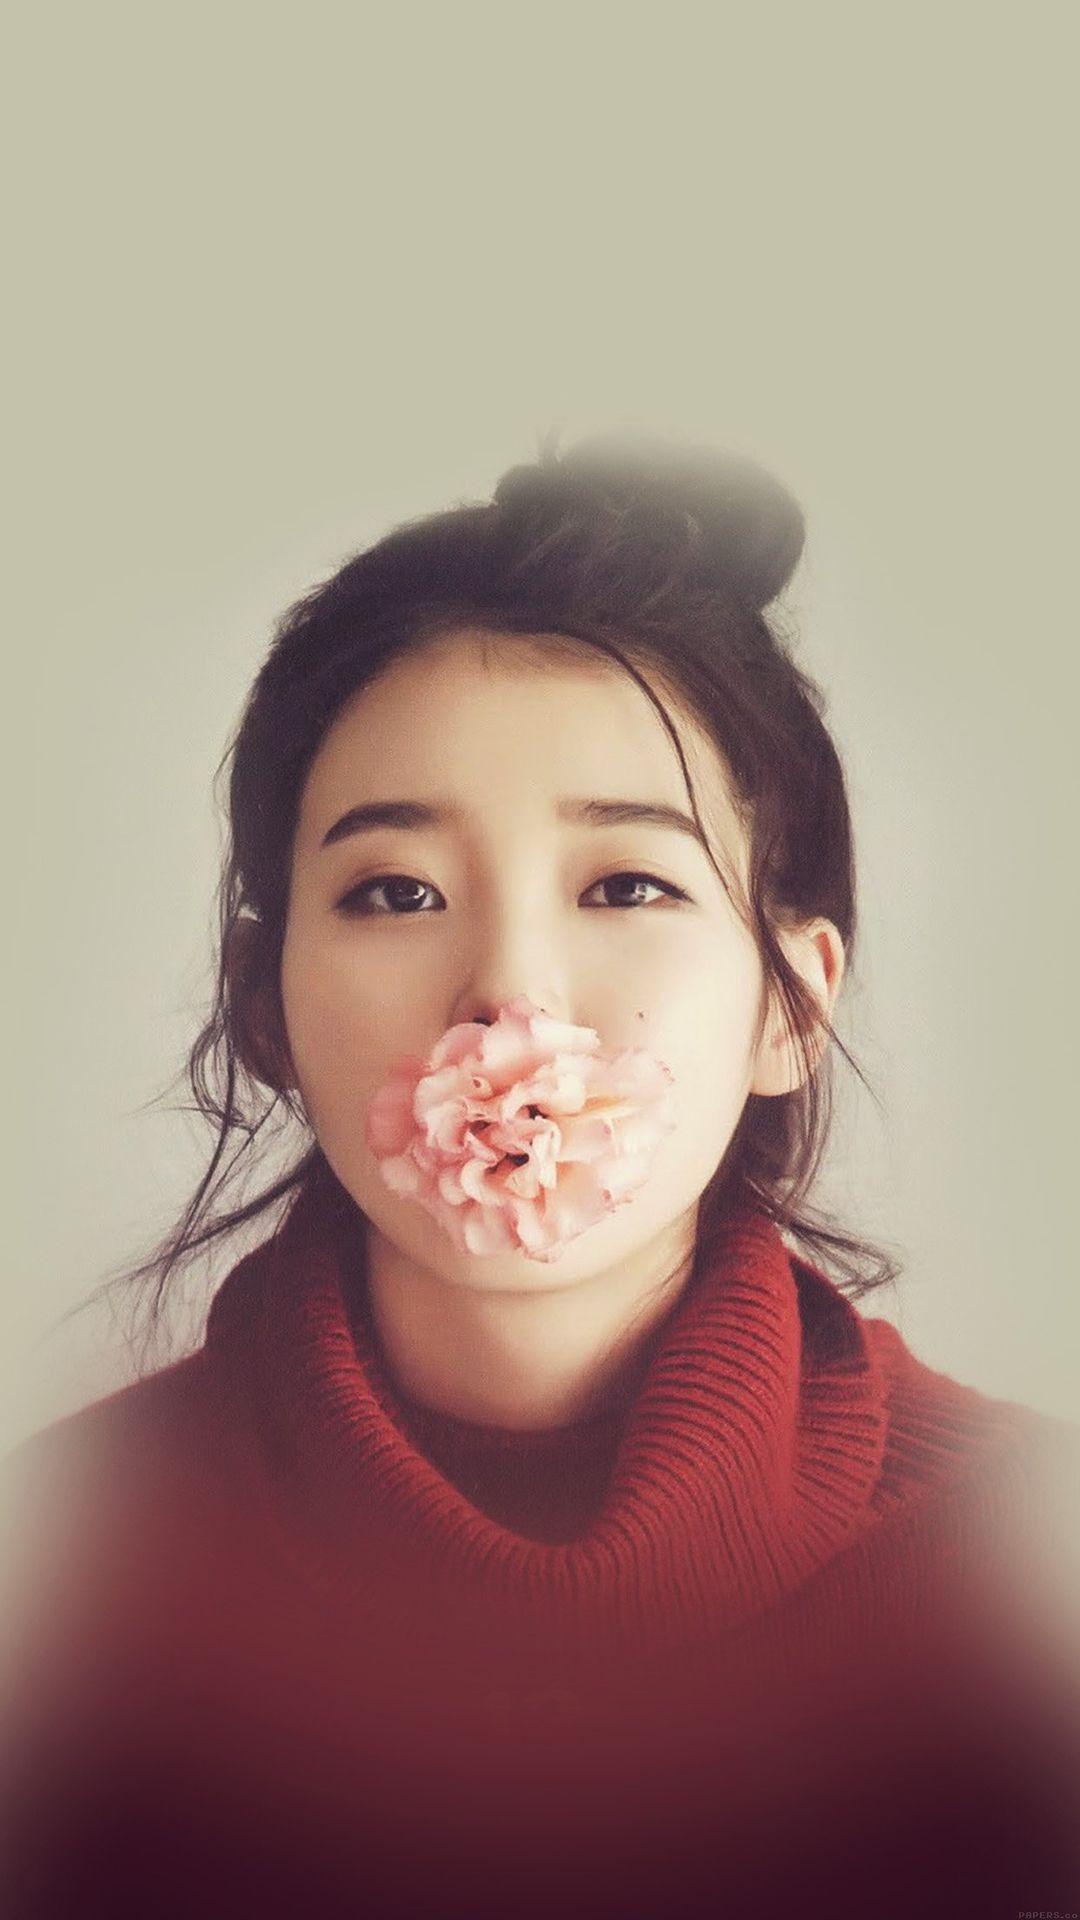 Kpop Iu Singer Music Cute Girl Sexy Iphone 7 Wallpaper Iphone 6